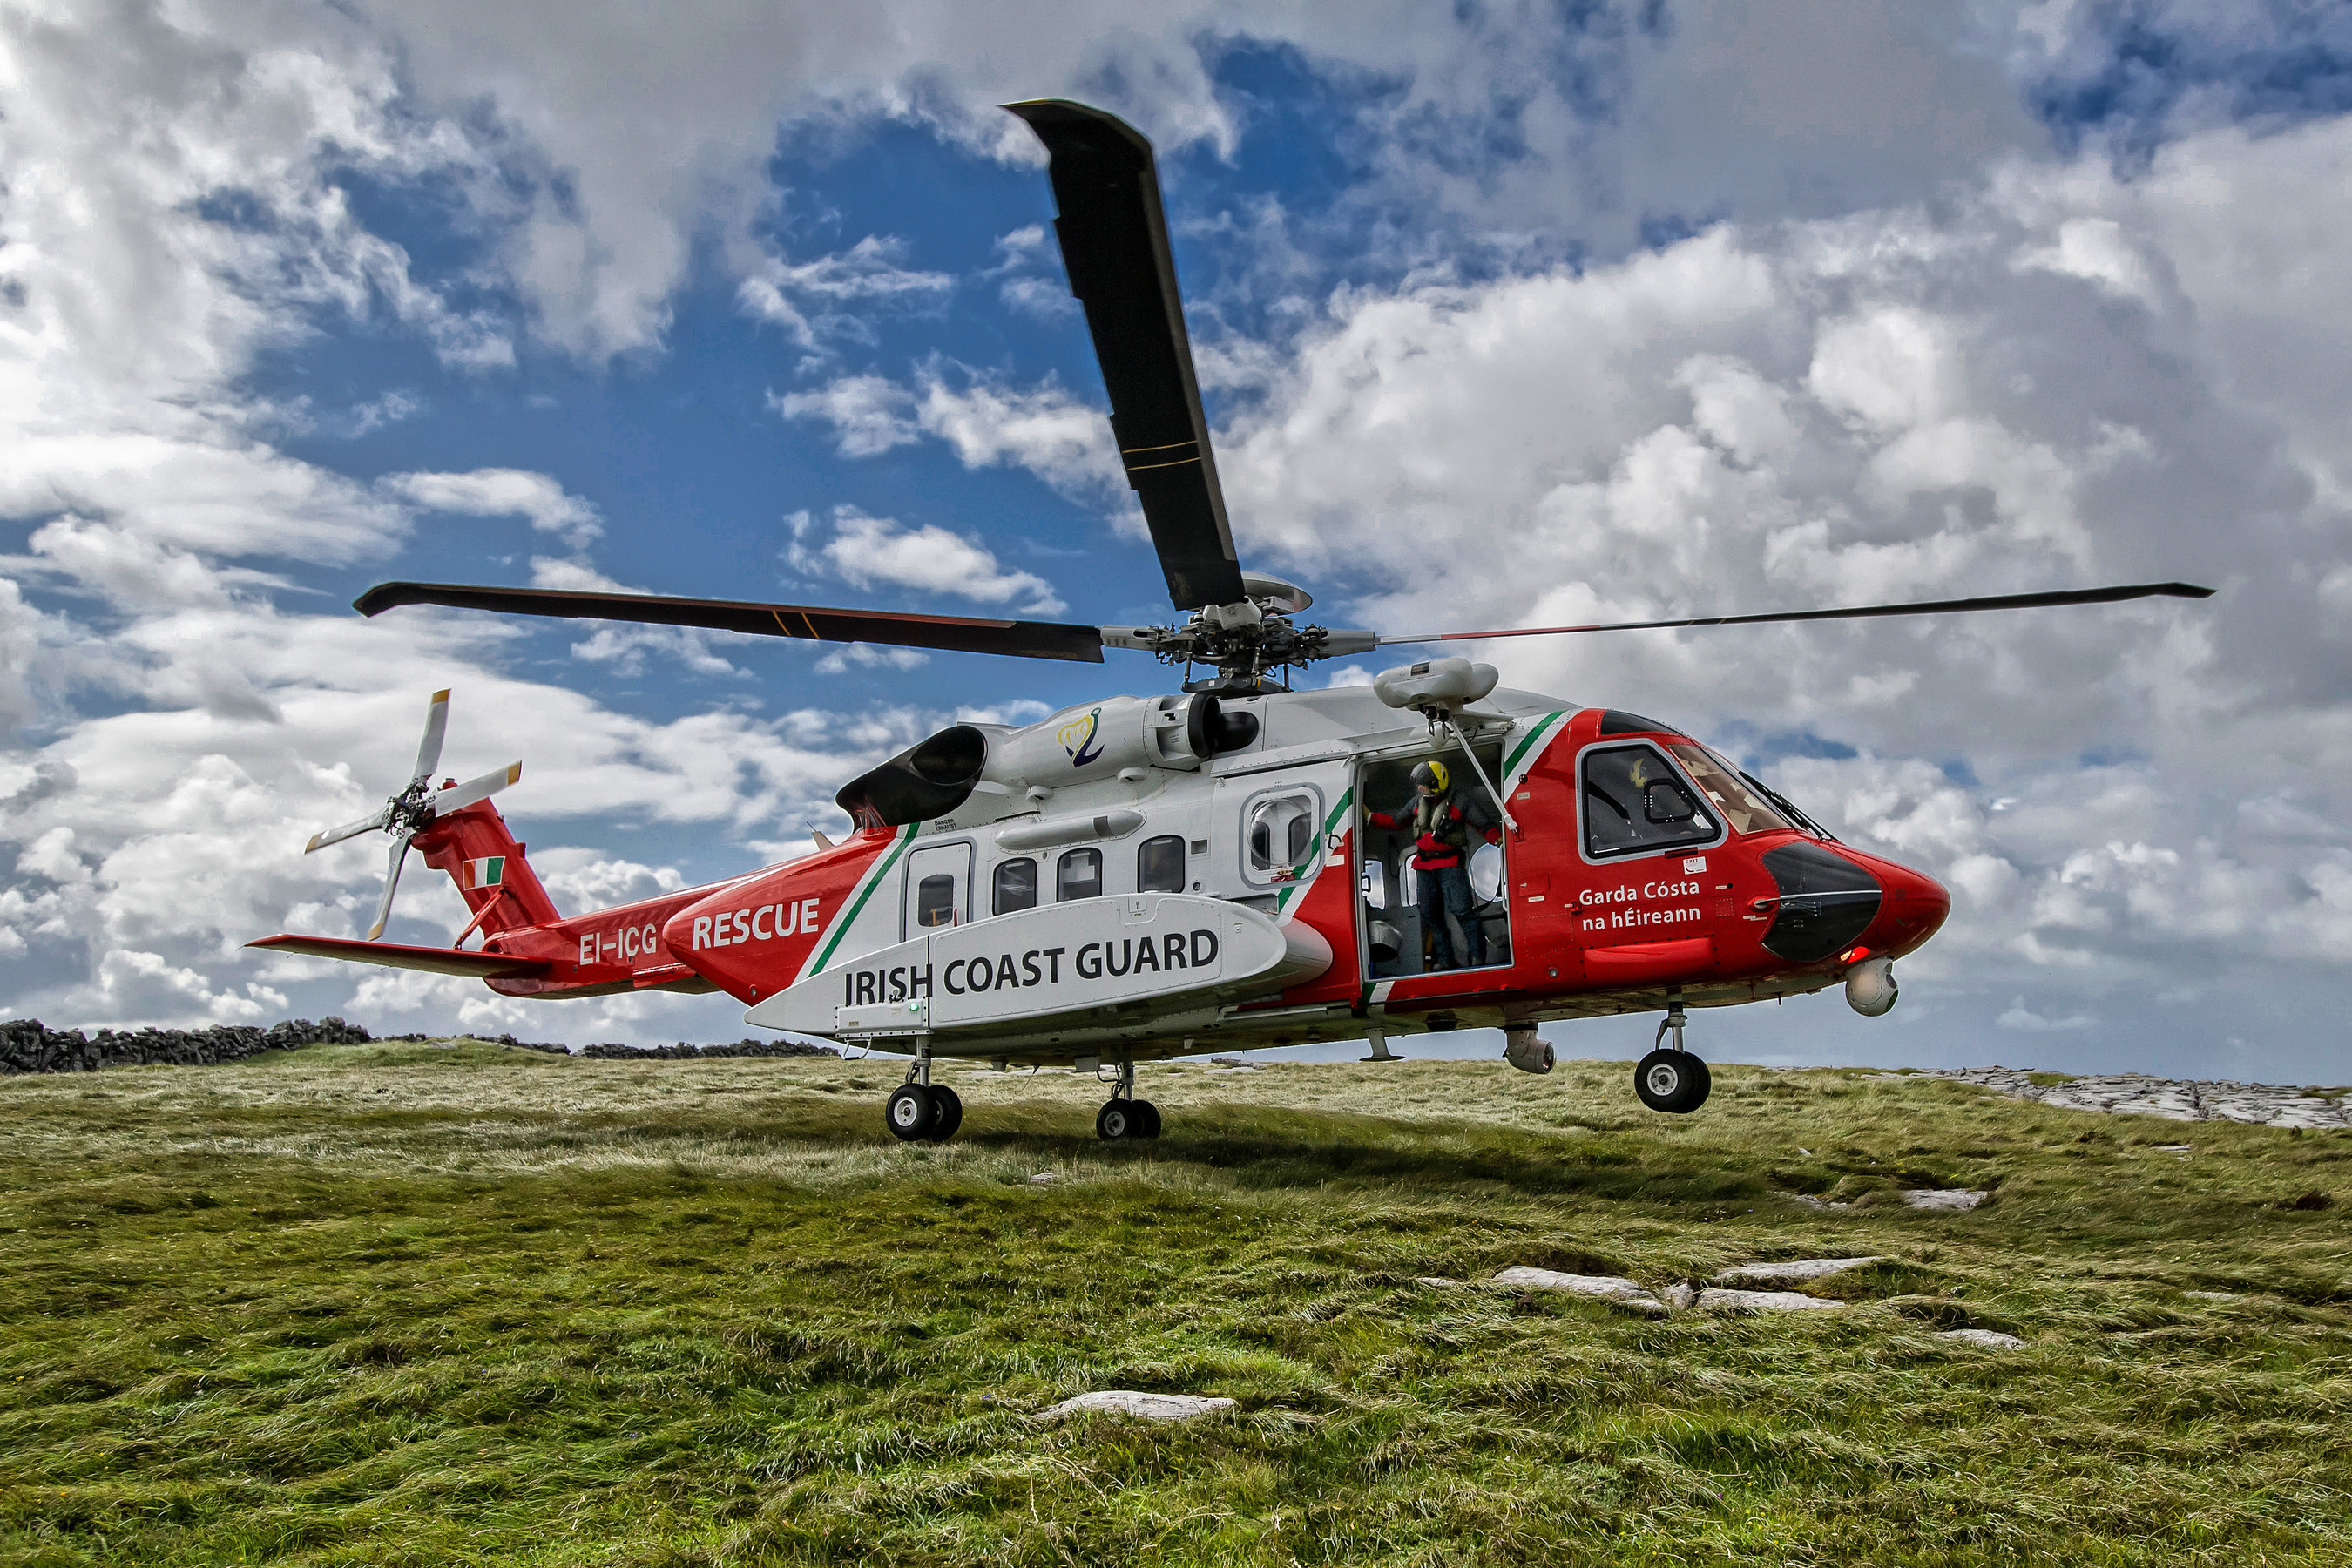 Irish Coast Guard and CHC Perform More than 1,000 SAR